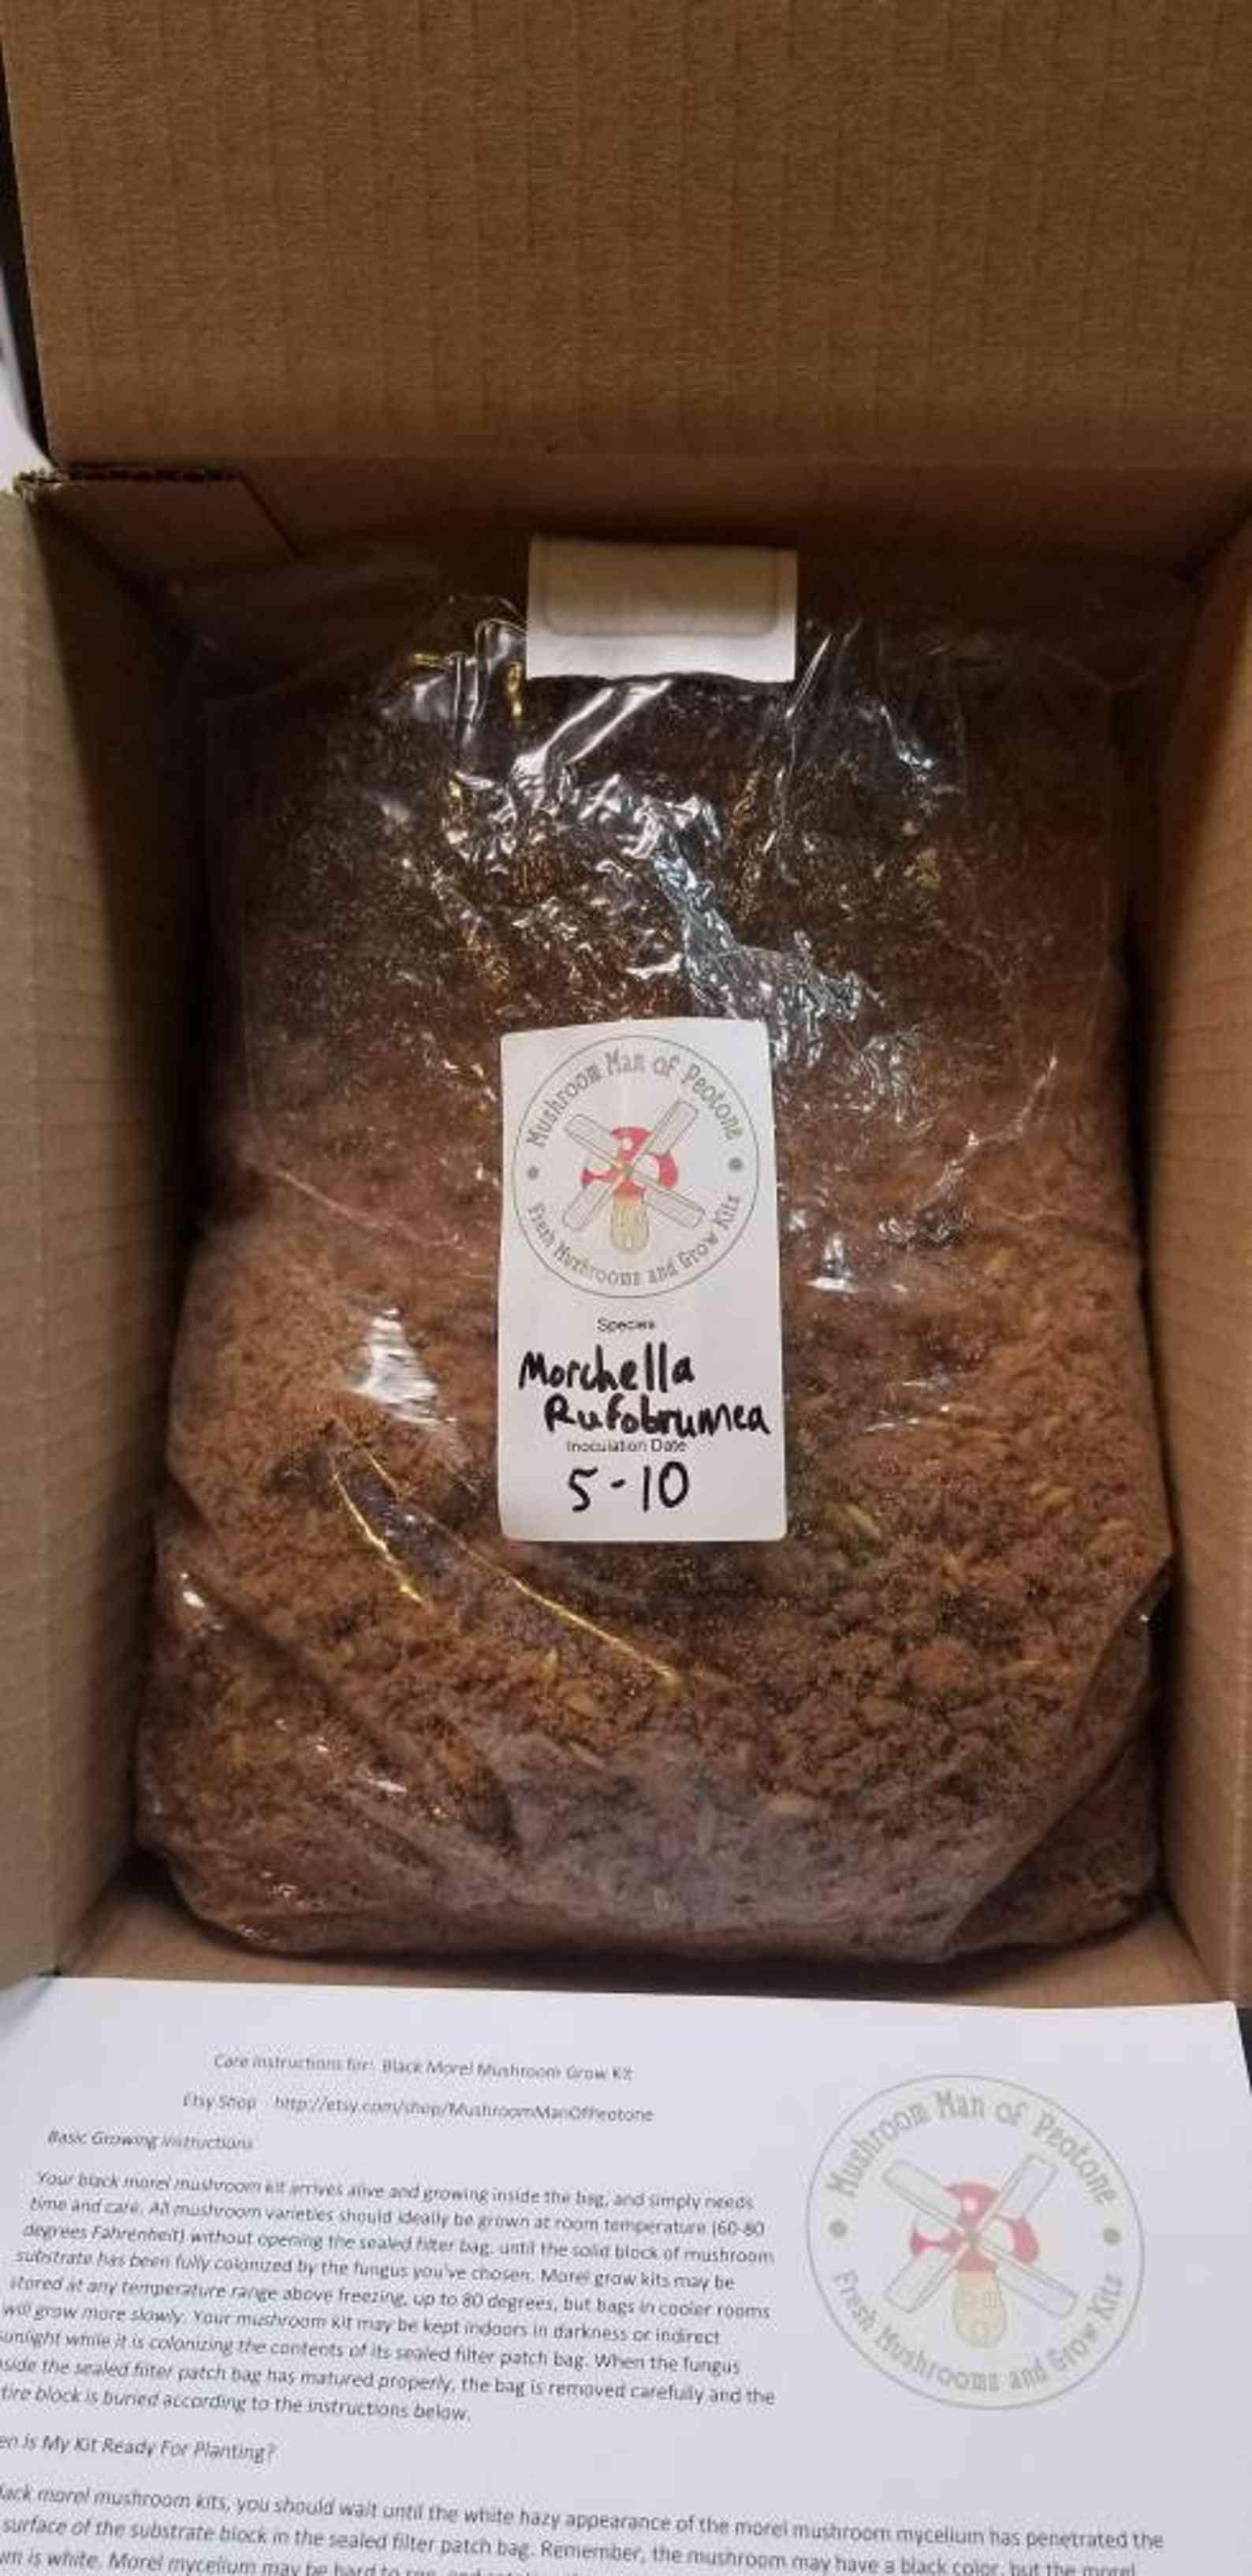 Mushroom Man Of Peotone Morel Mushrooms Grow Kit